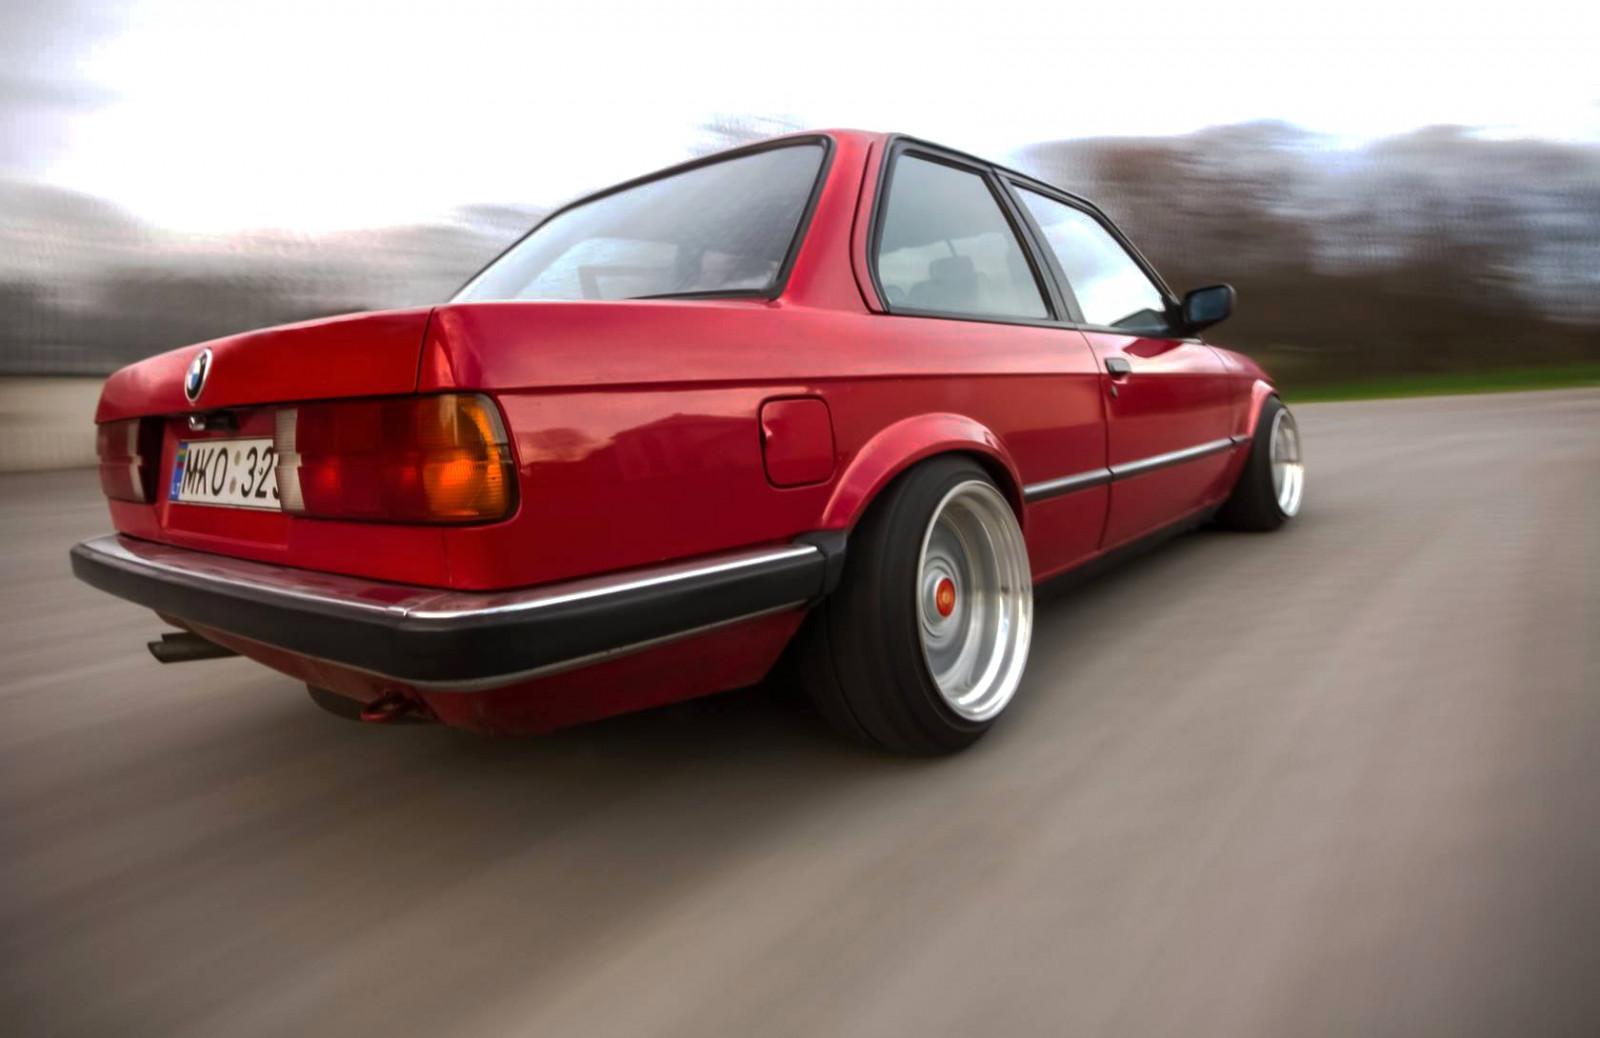 fond d 39 cran v hicule vieille voiture voitures rouges voitures musculaires plus l ger. Black Bedroom Furniture Sets. Home Design Ideas